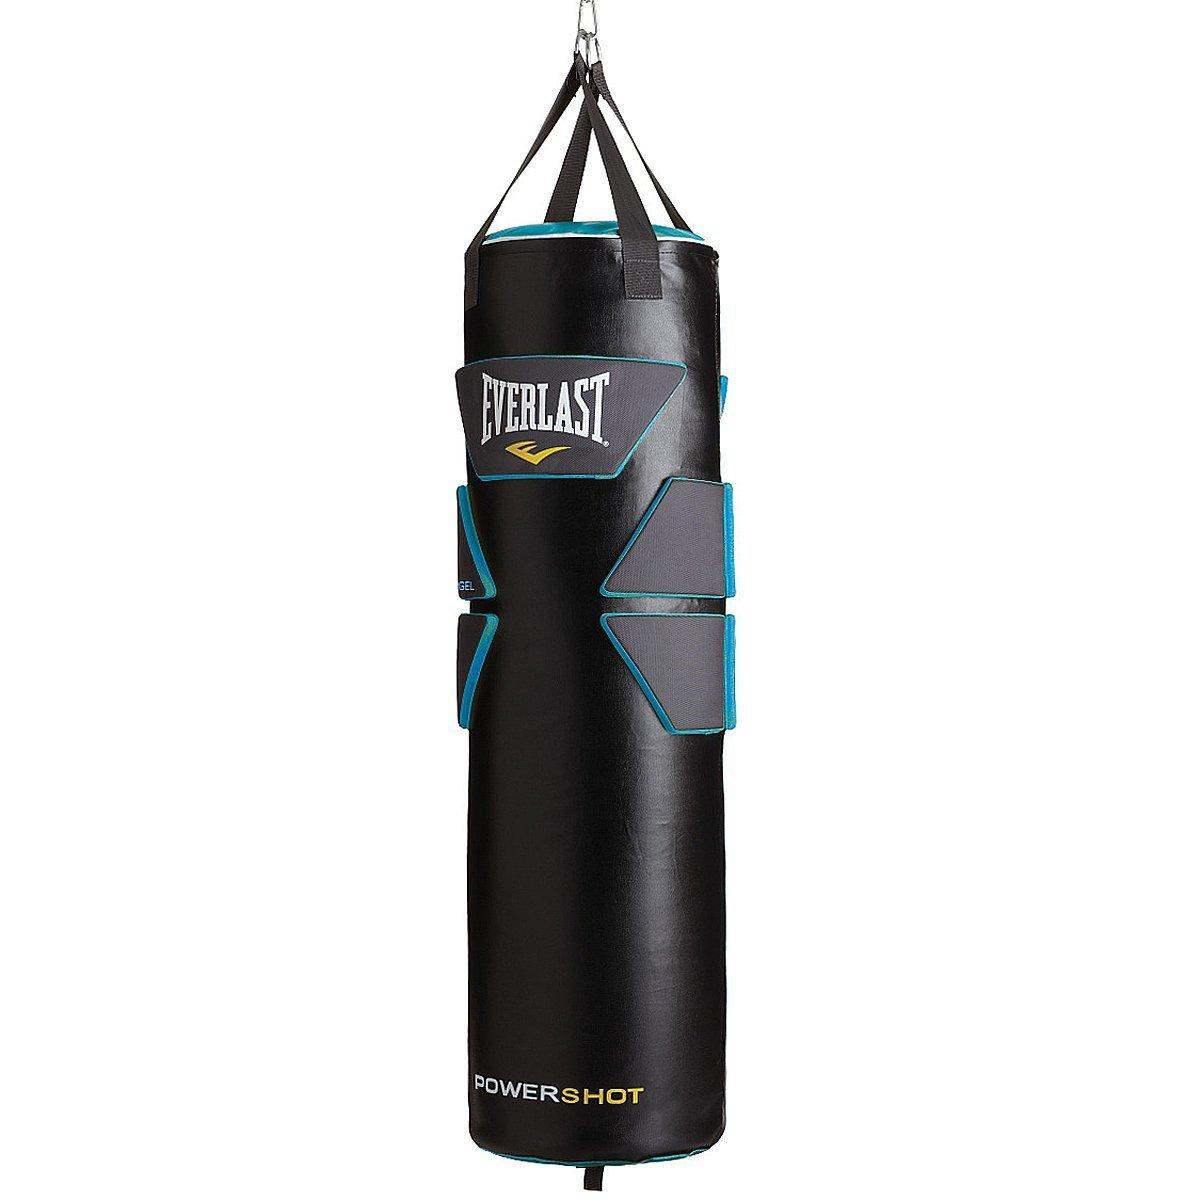 Everrlast 80-lb PowerShot Heavy Bag by Everrlast